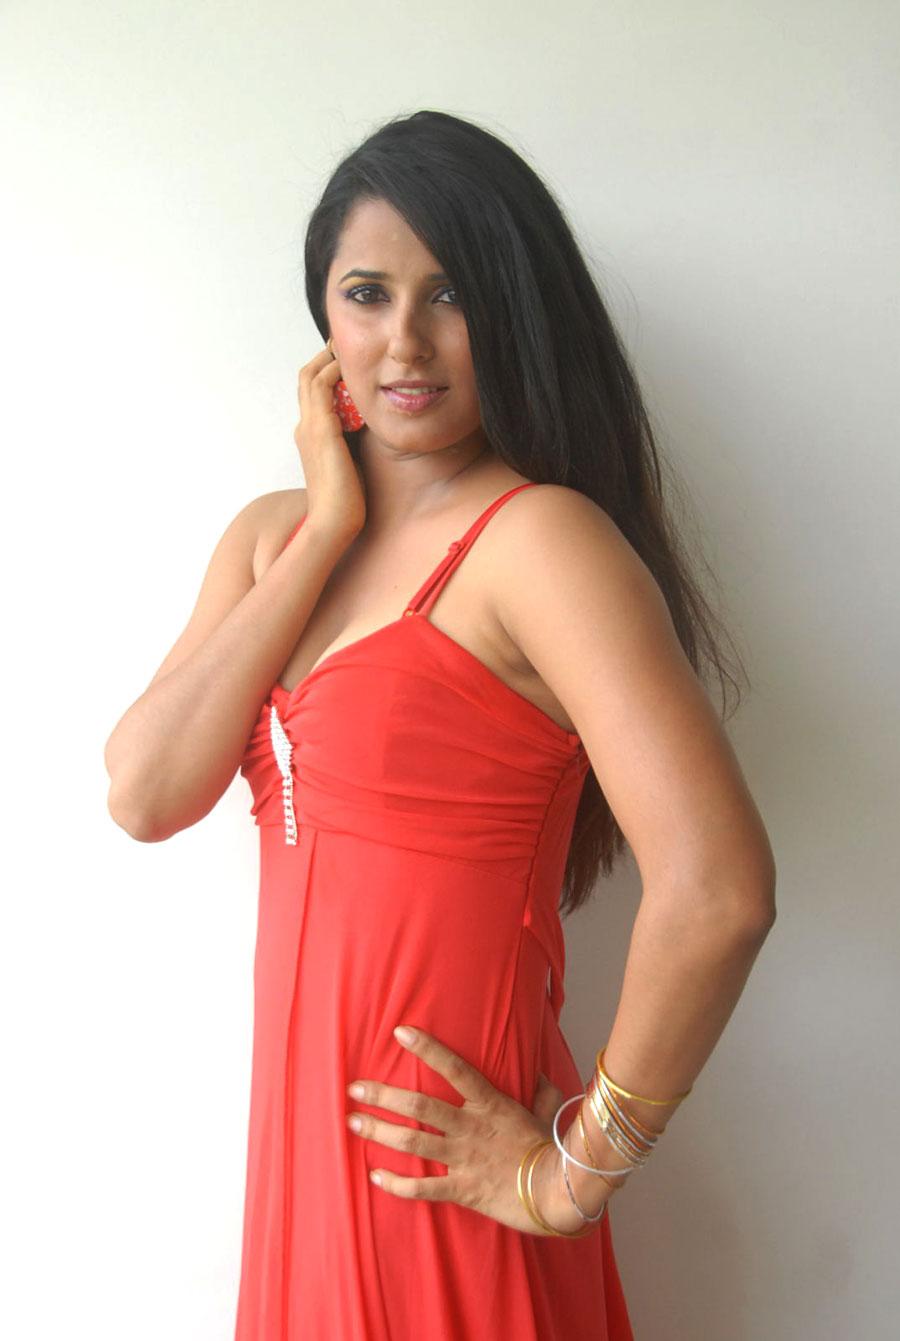 beautiful Shravya reddy in red dress hot photos gallery